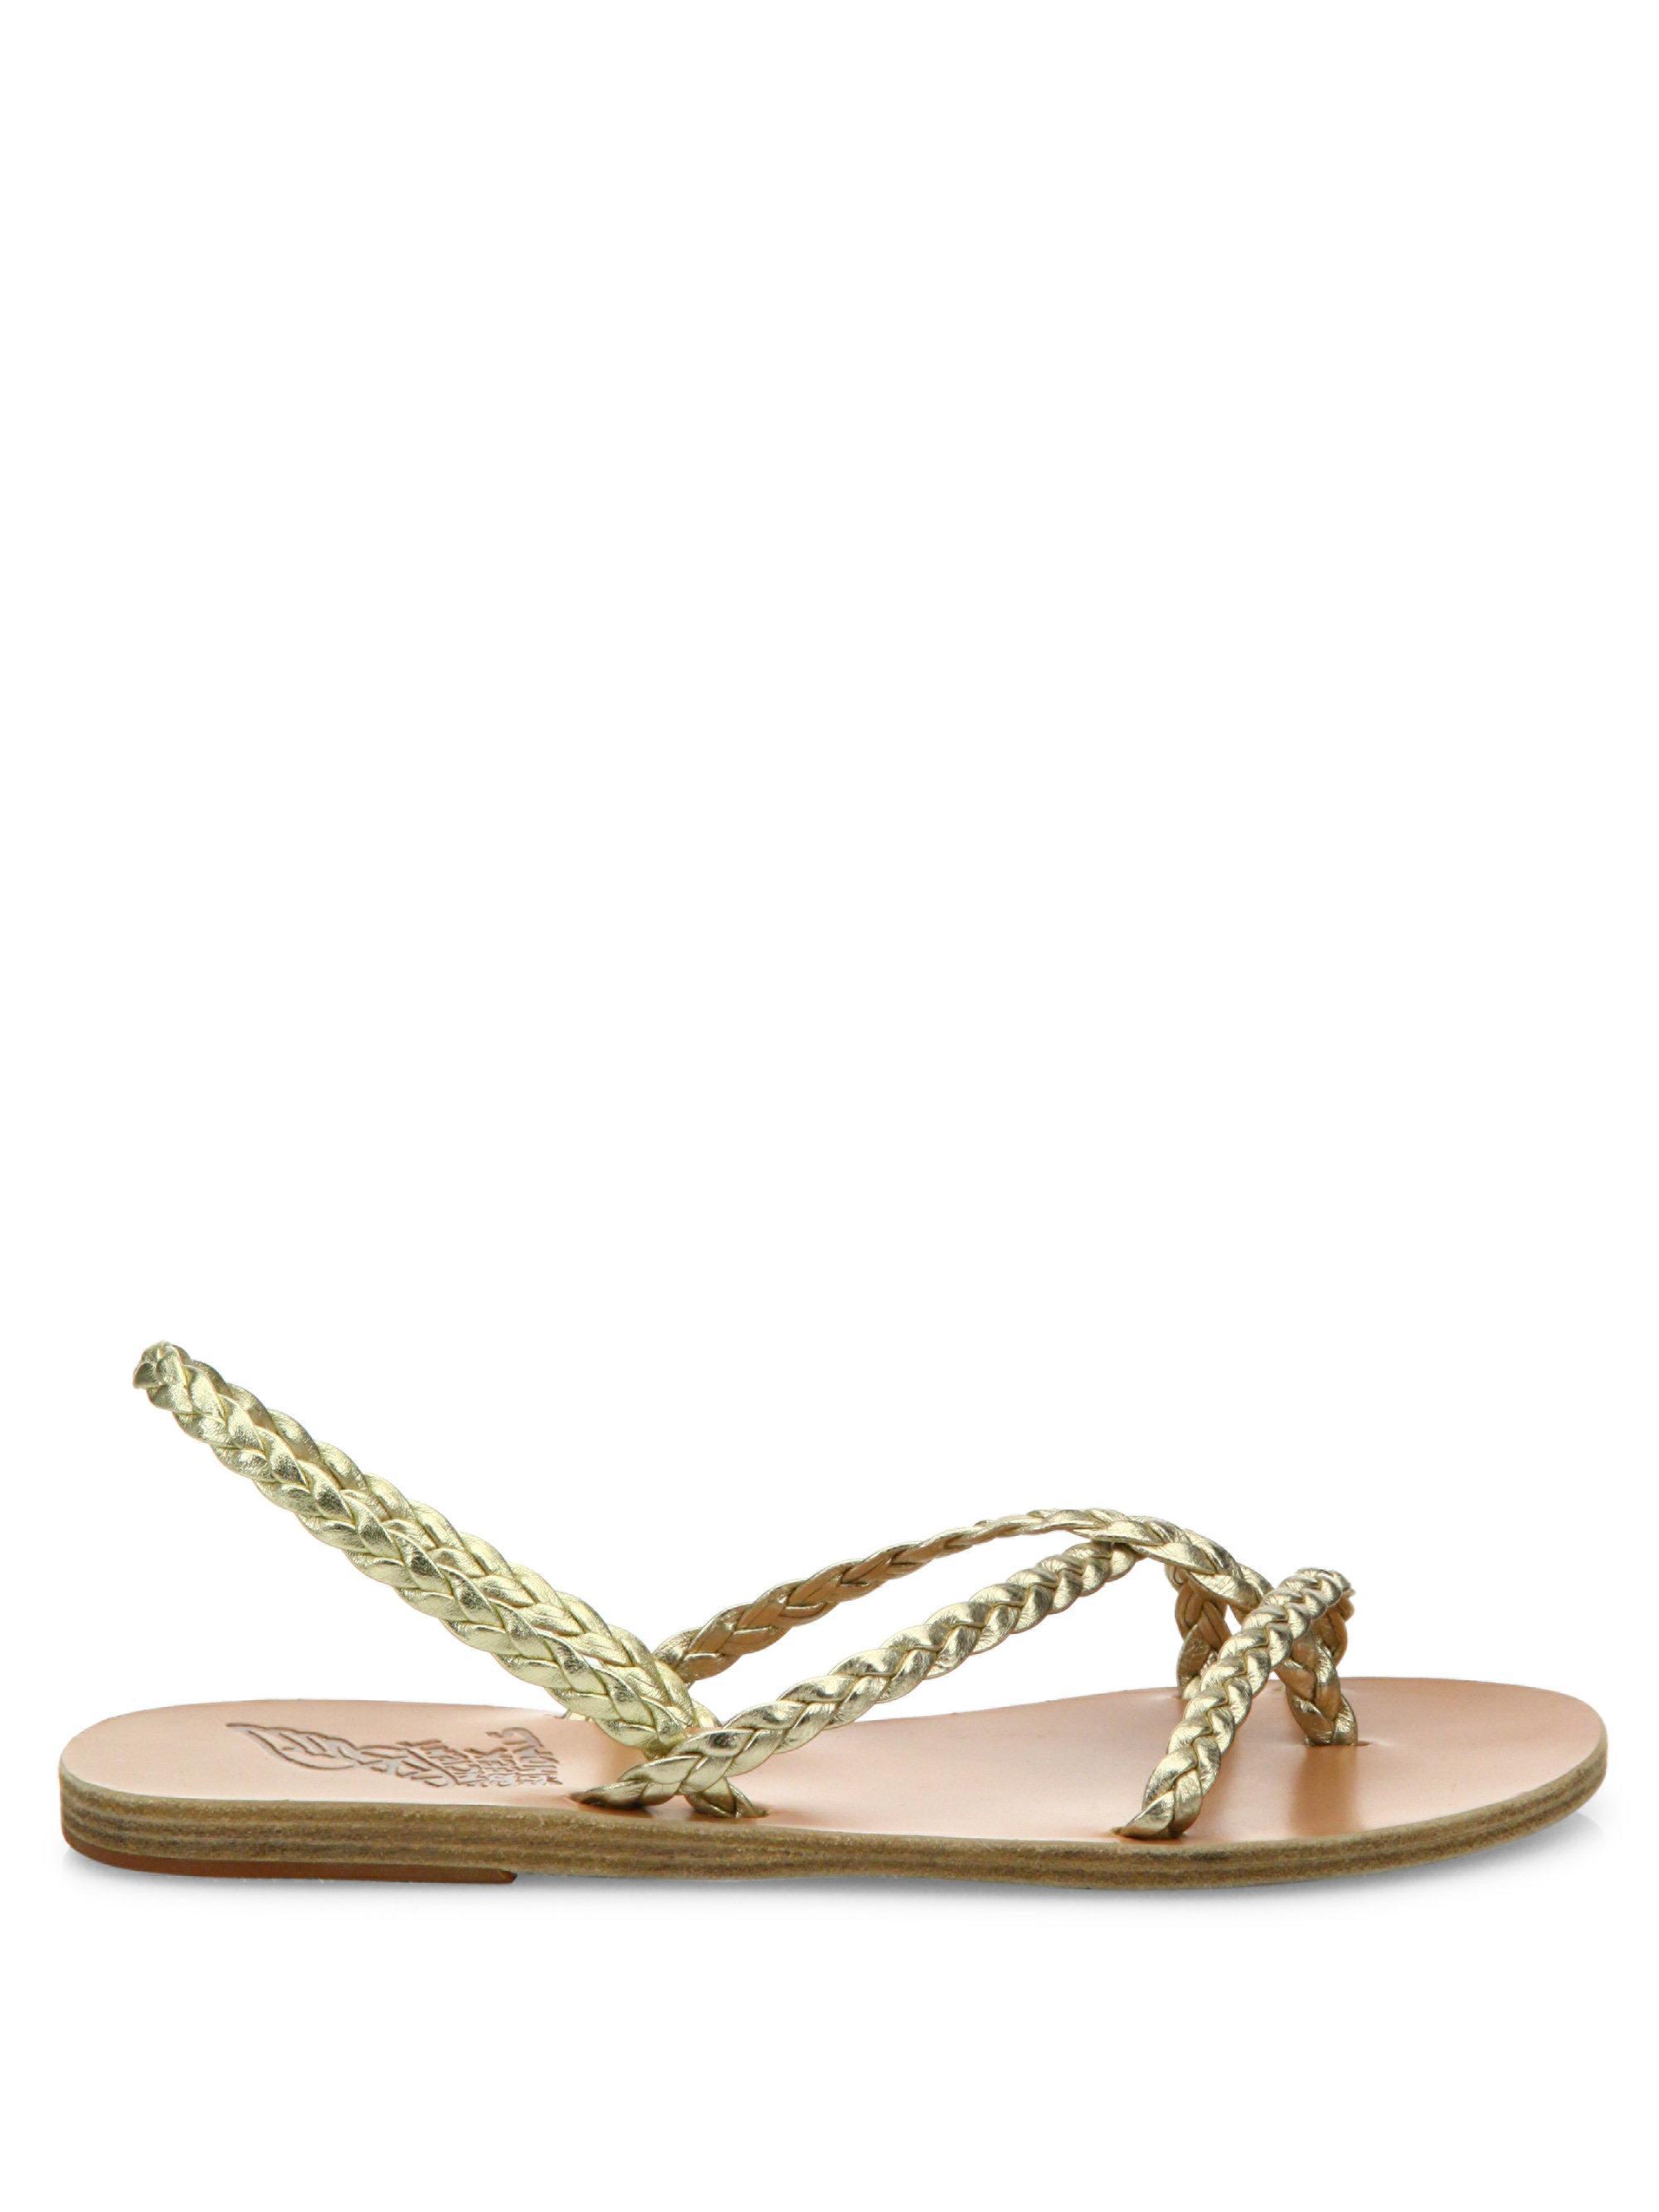 Ancient Greek Sandals Yianna Braided Vachetta Leather Flat Sandals MypYPS